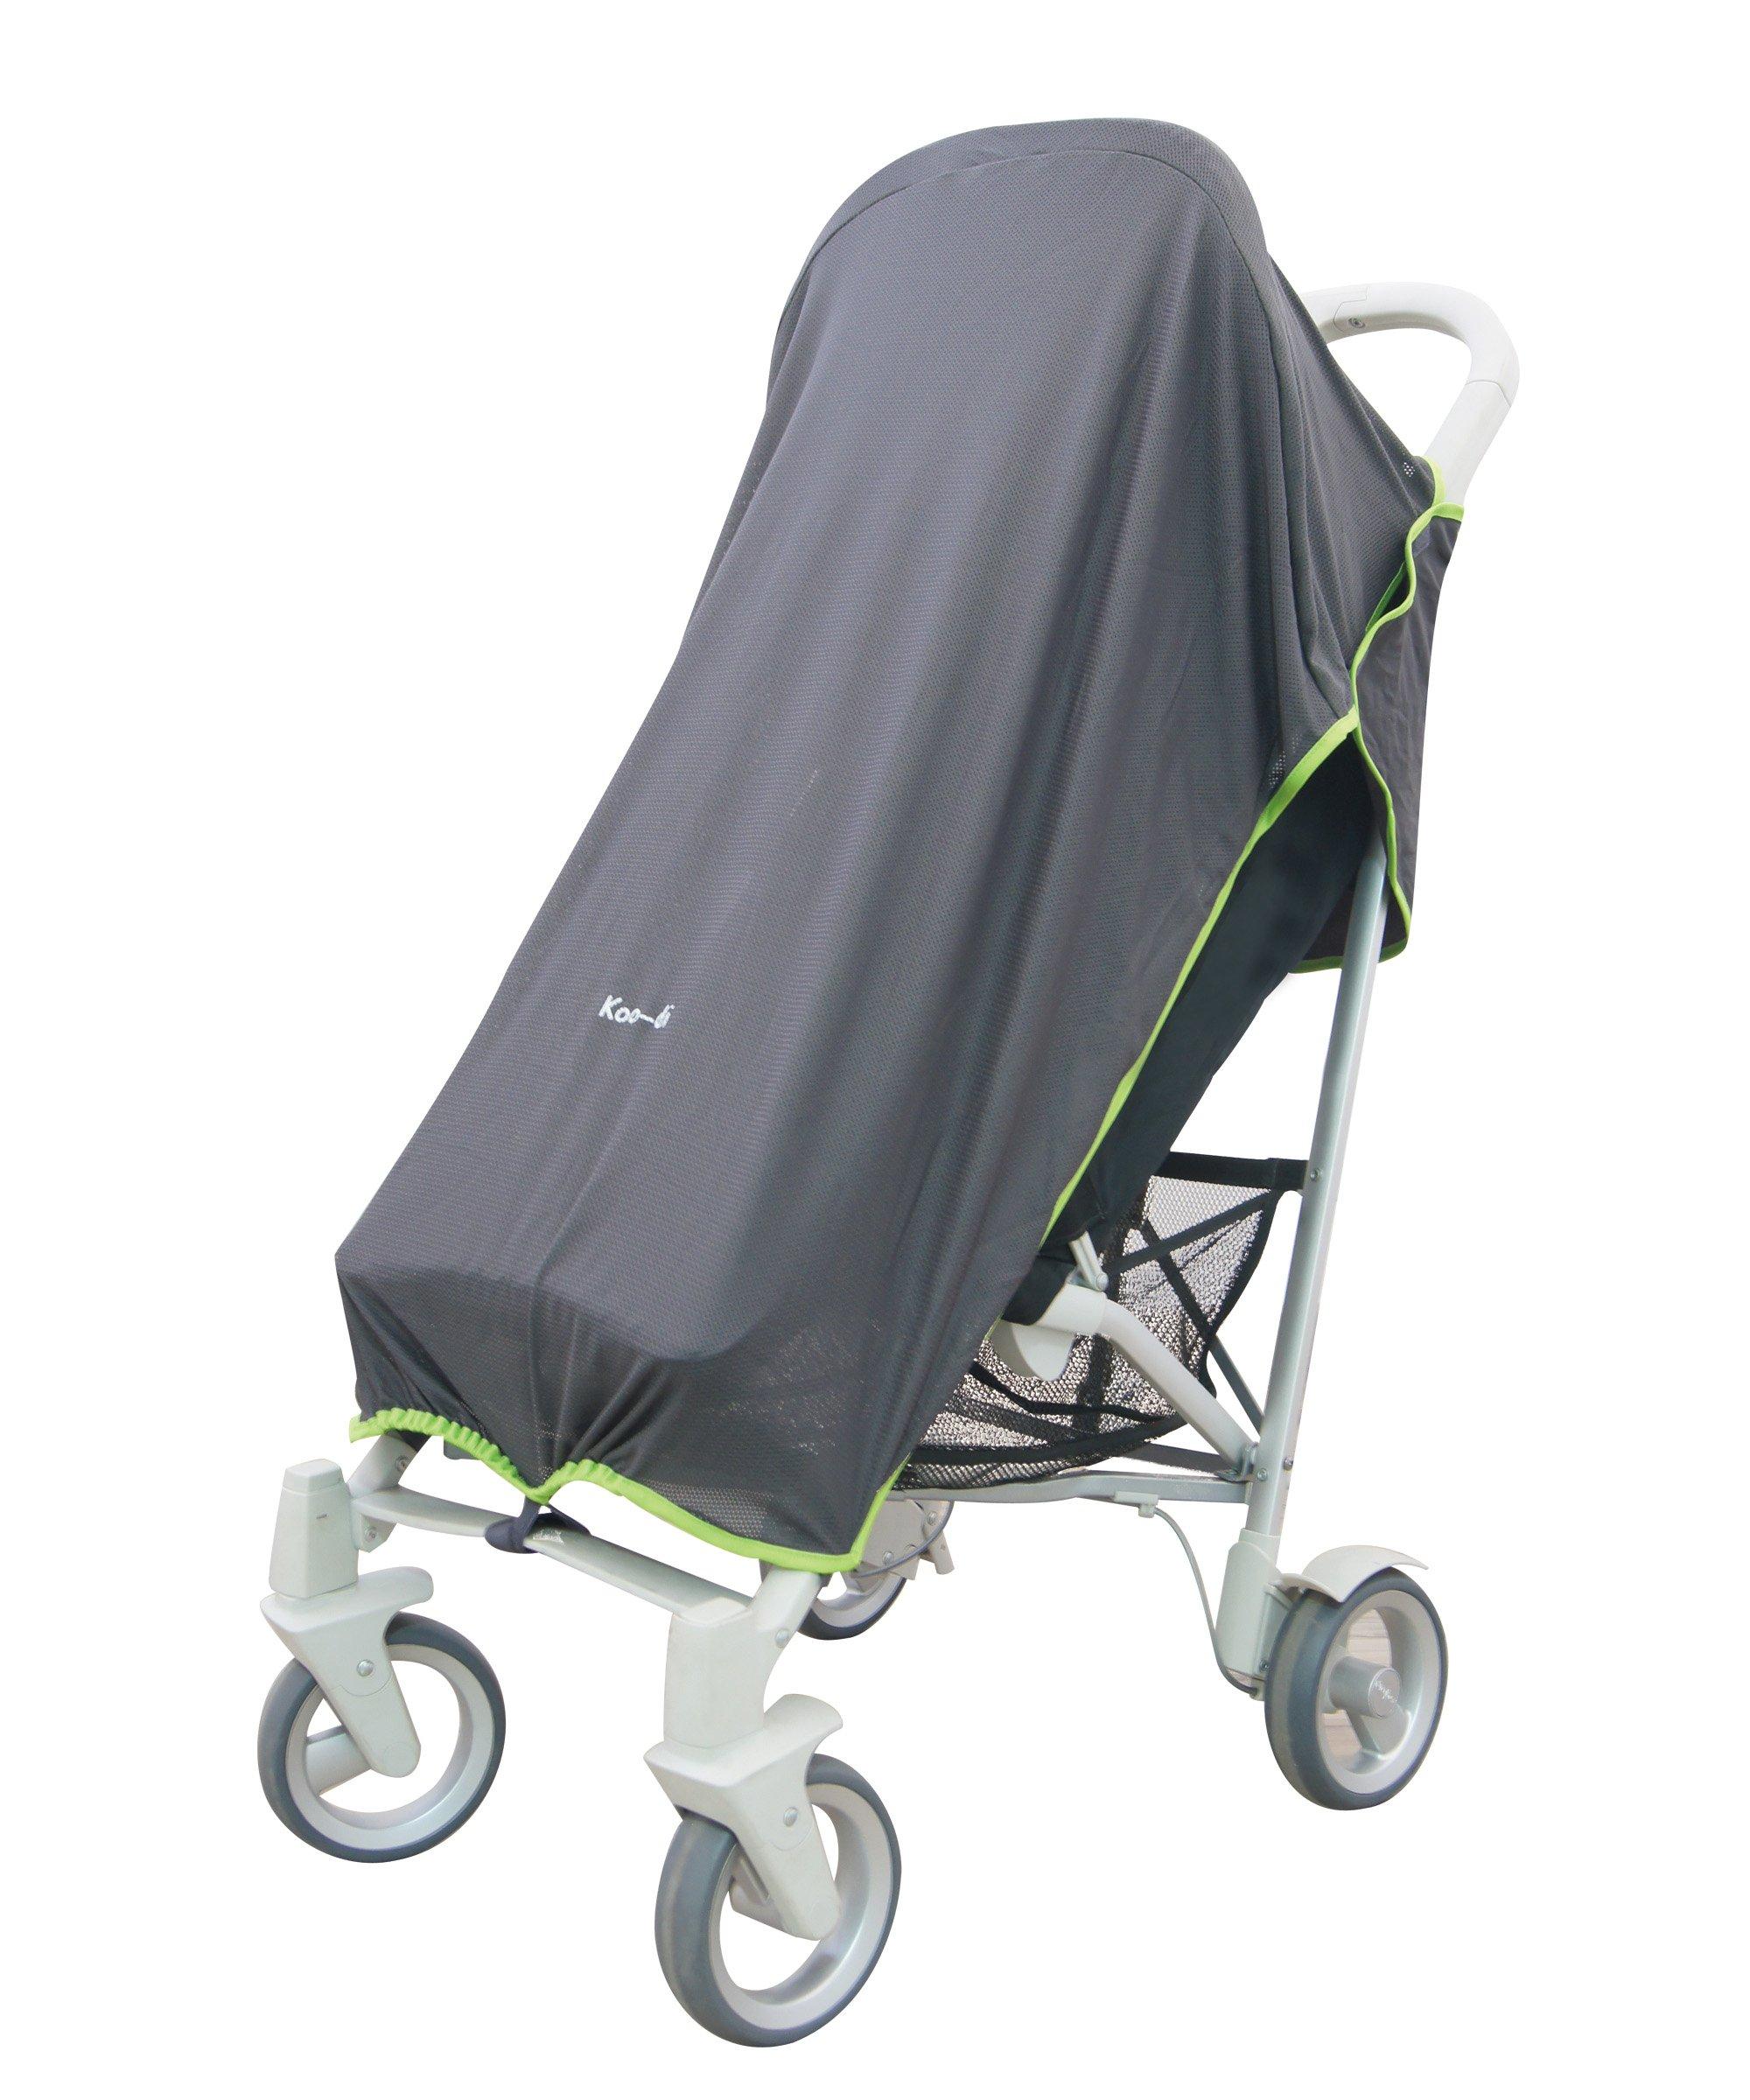 Altabebe AL2801KJ-77 Handmuffs for Stroller Dark Grey